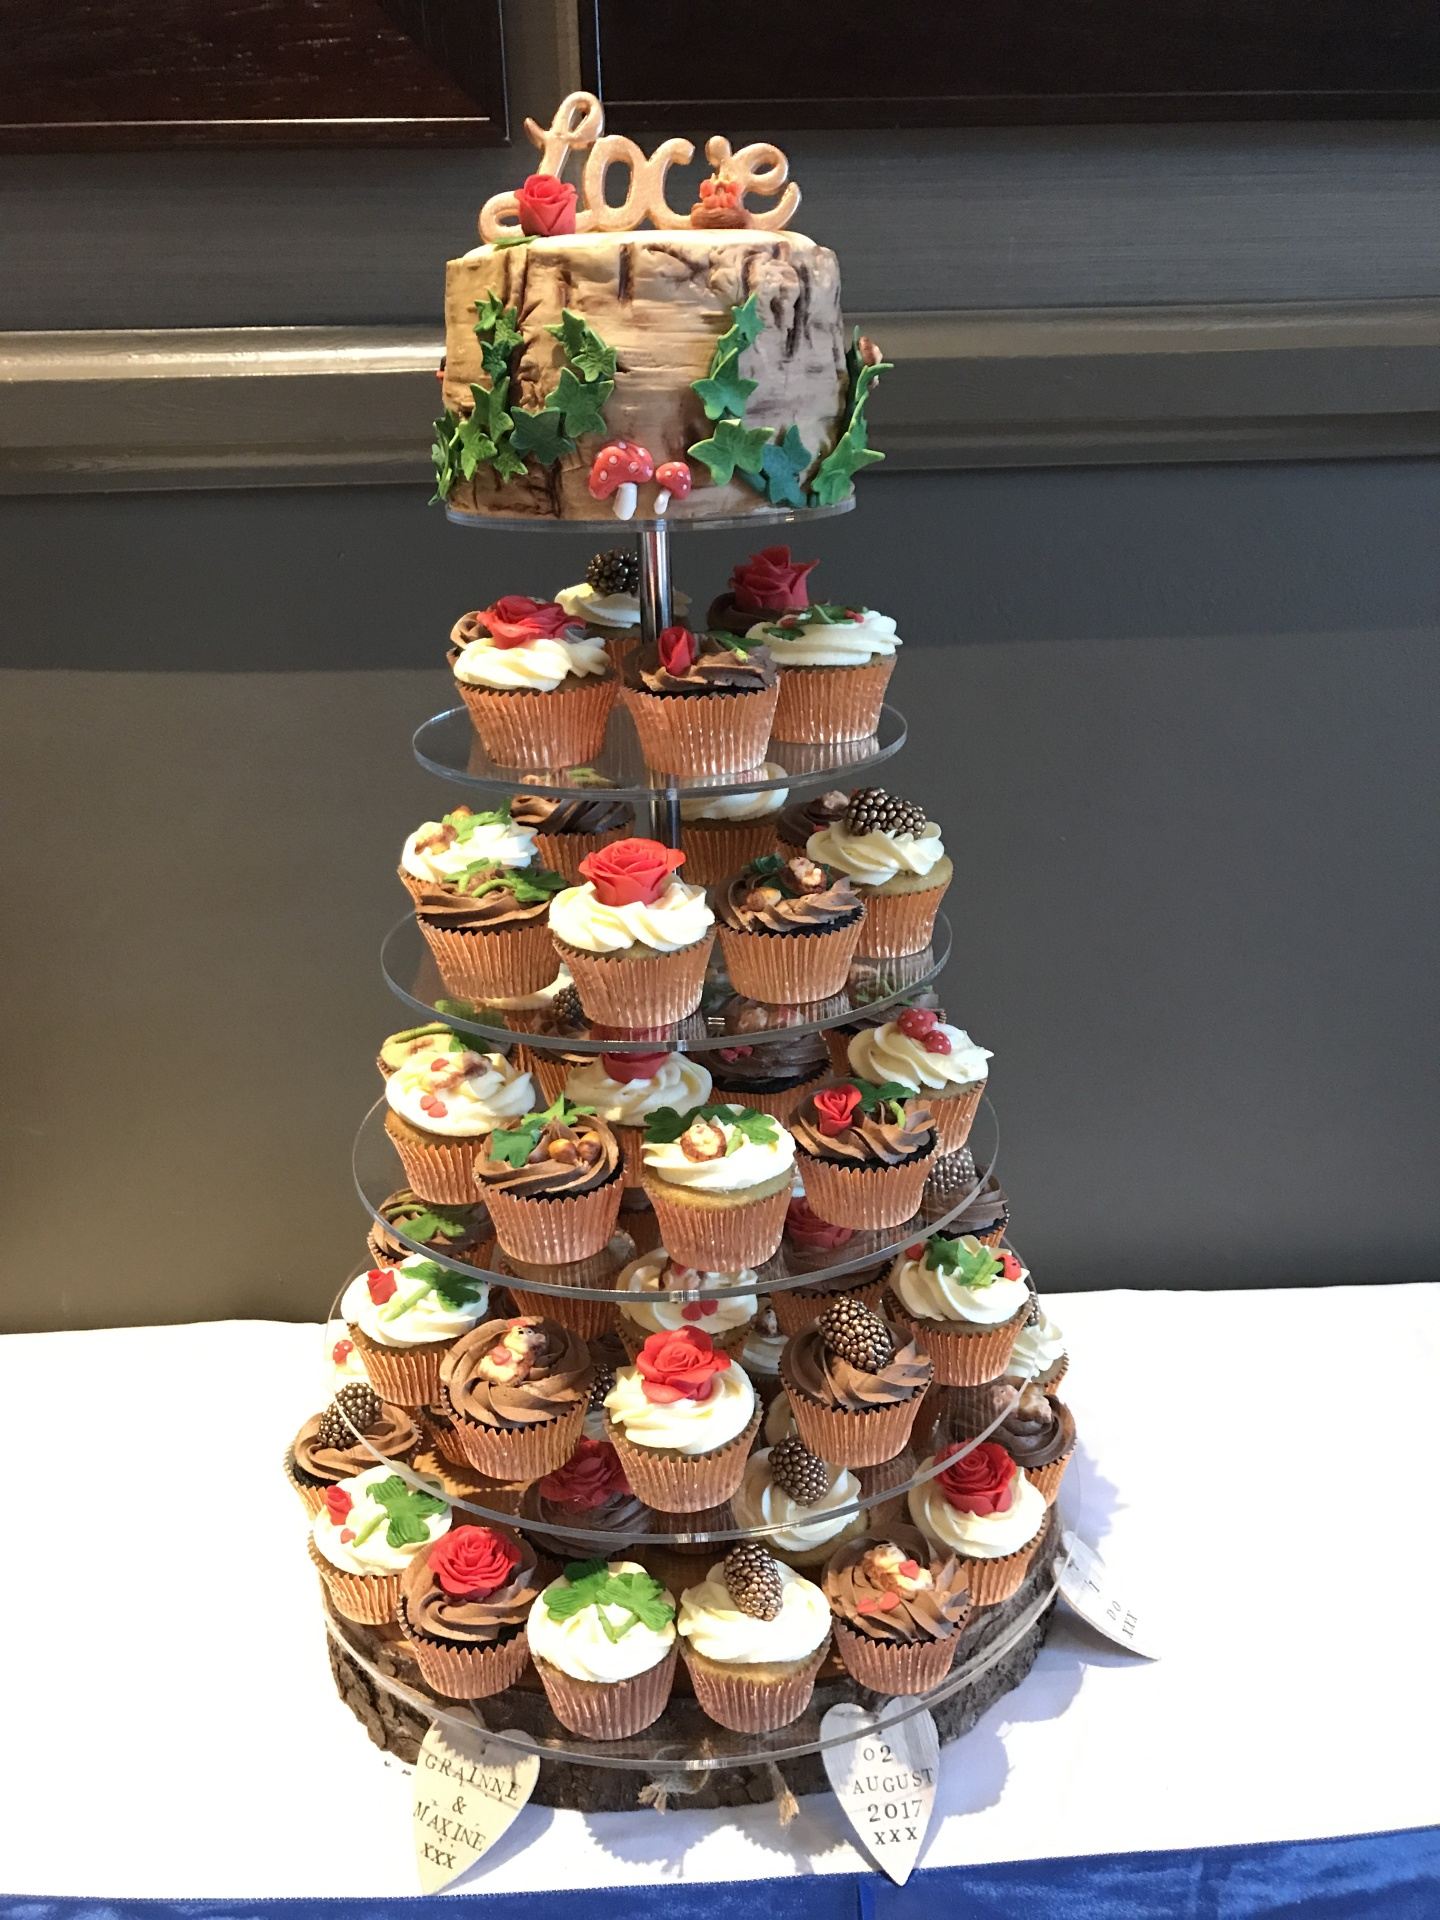 vegan, cake, cakes, weddings, wedding, UK, north west, Lancashire, Greater Manchester, Merseyside, Cheshire, Cumbria.